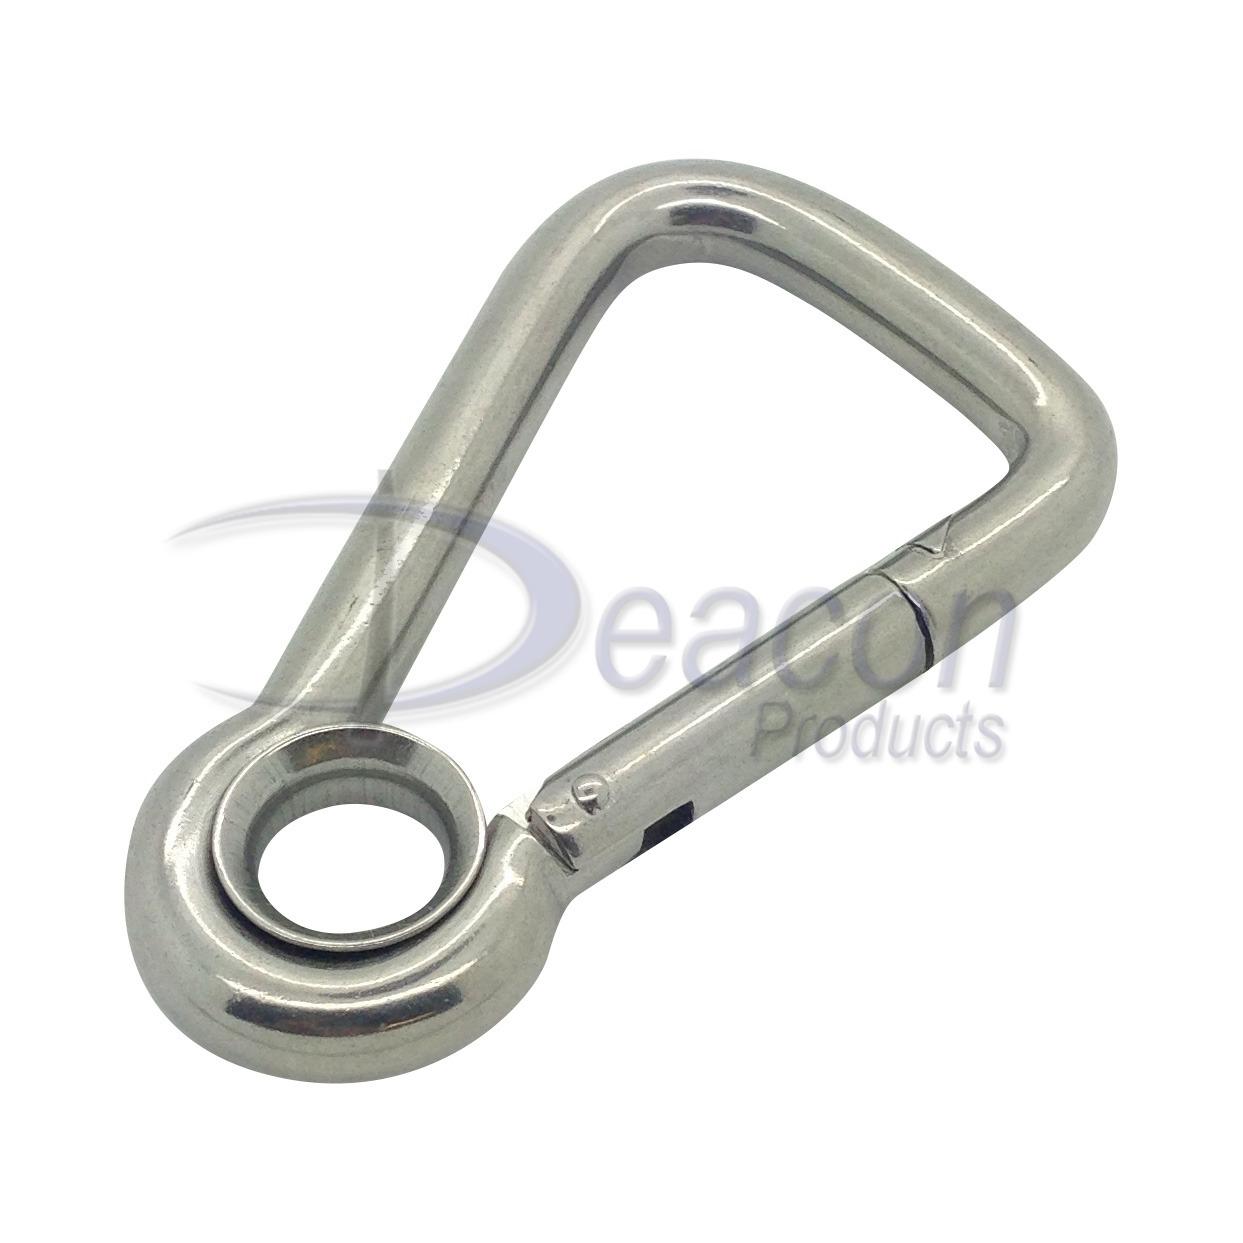 stainless-steel-asymmetric-carbine-hook-eyelet